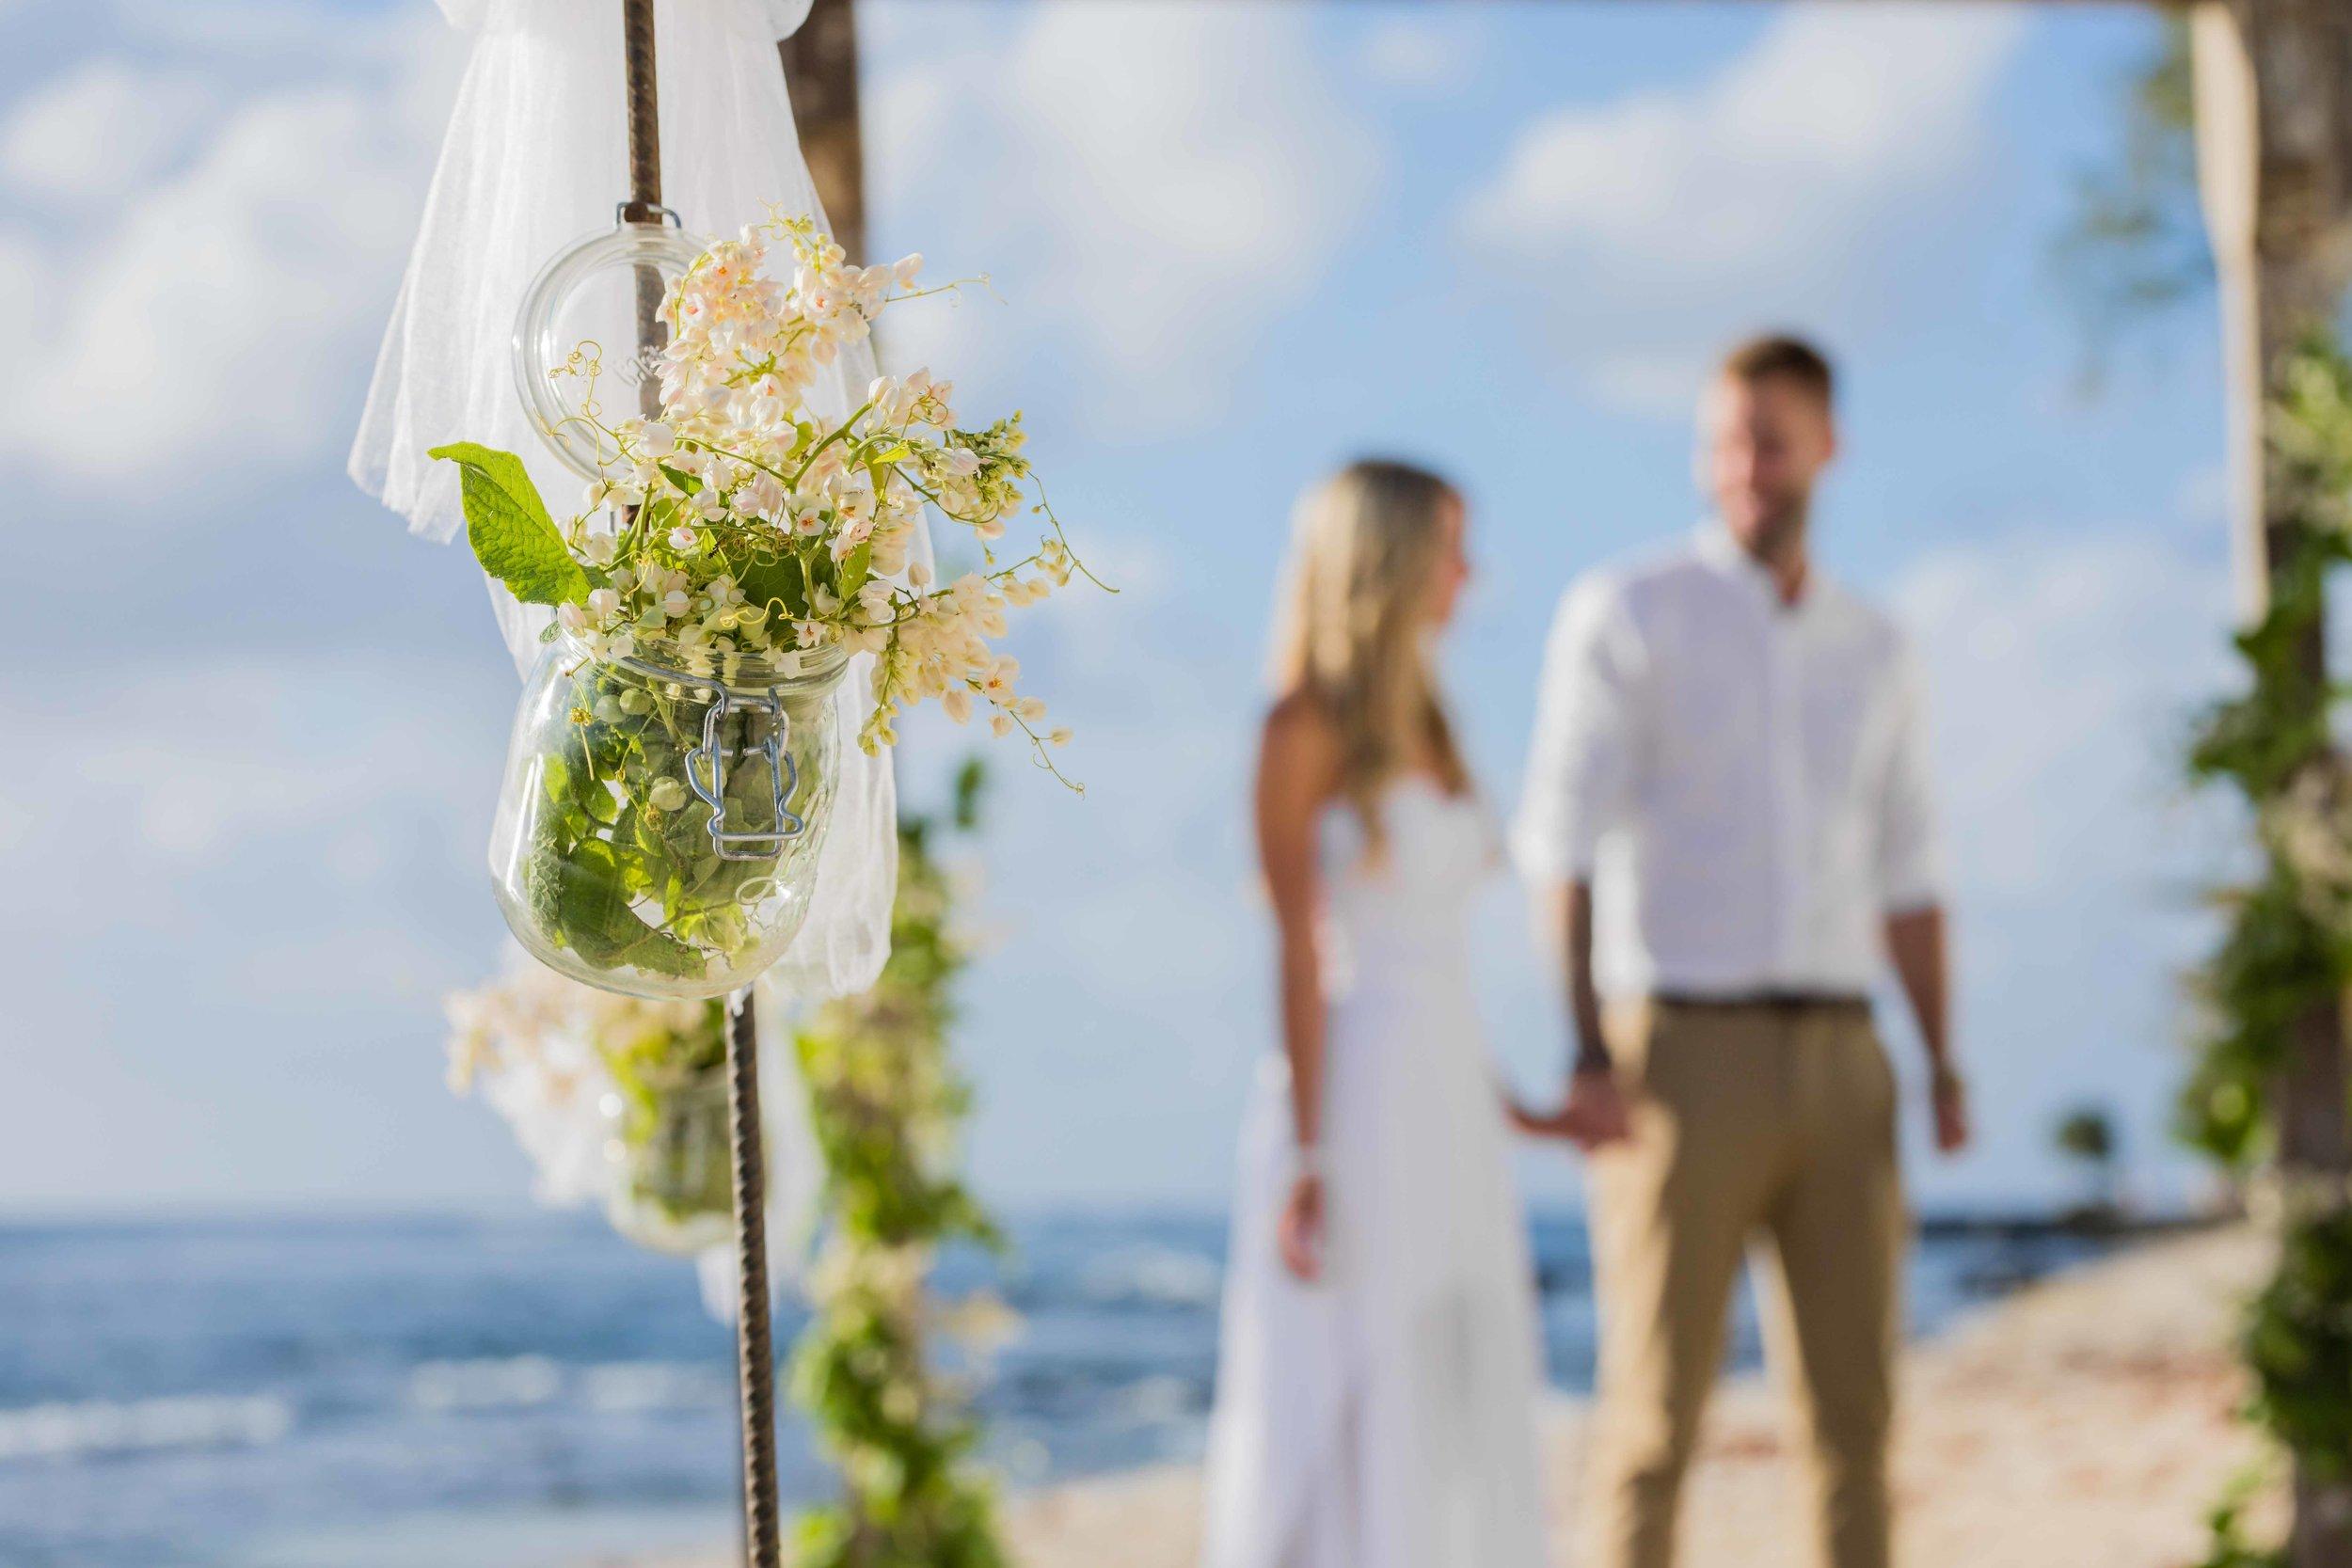 Wedding Decorations in Mauritius